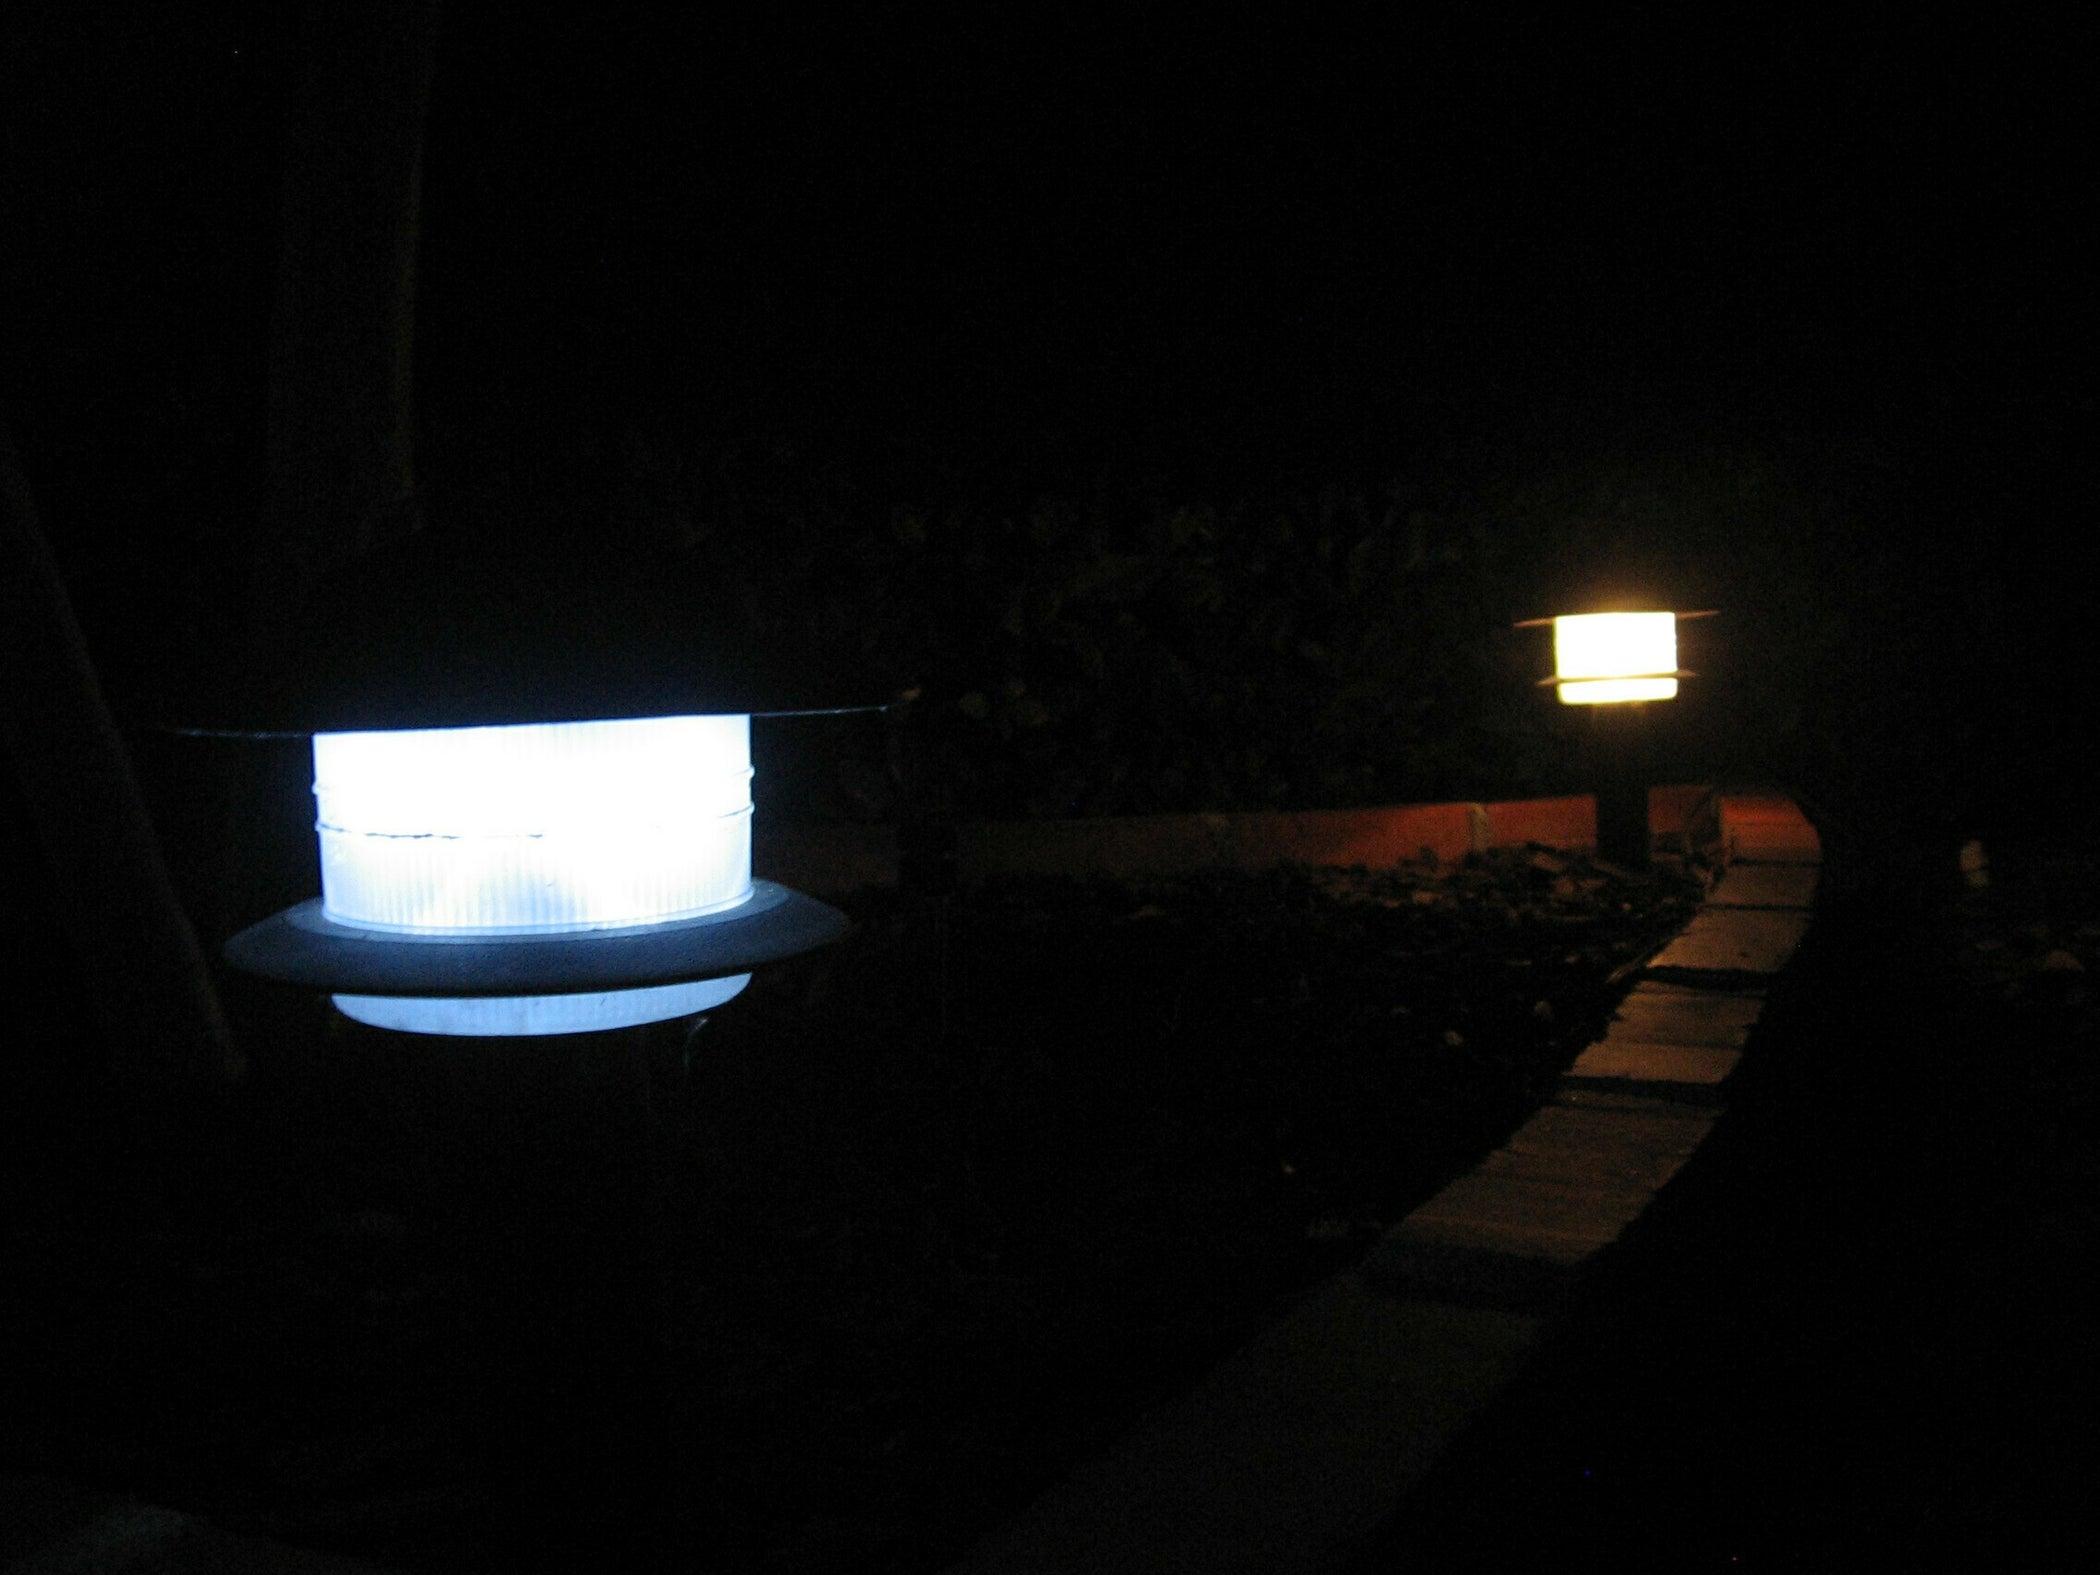 DIY LED Replacement Bulbs for 12 Volt Landscape Lighting ...